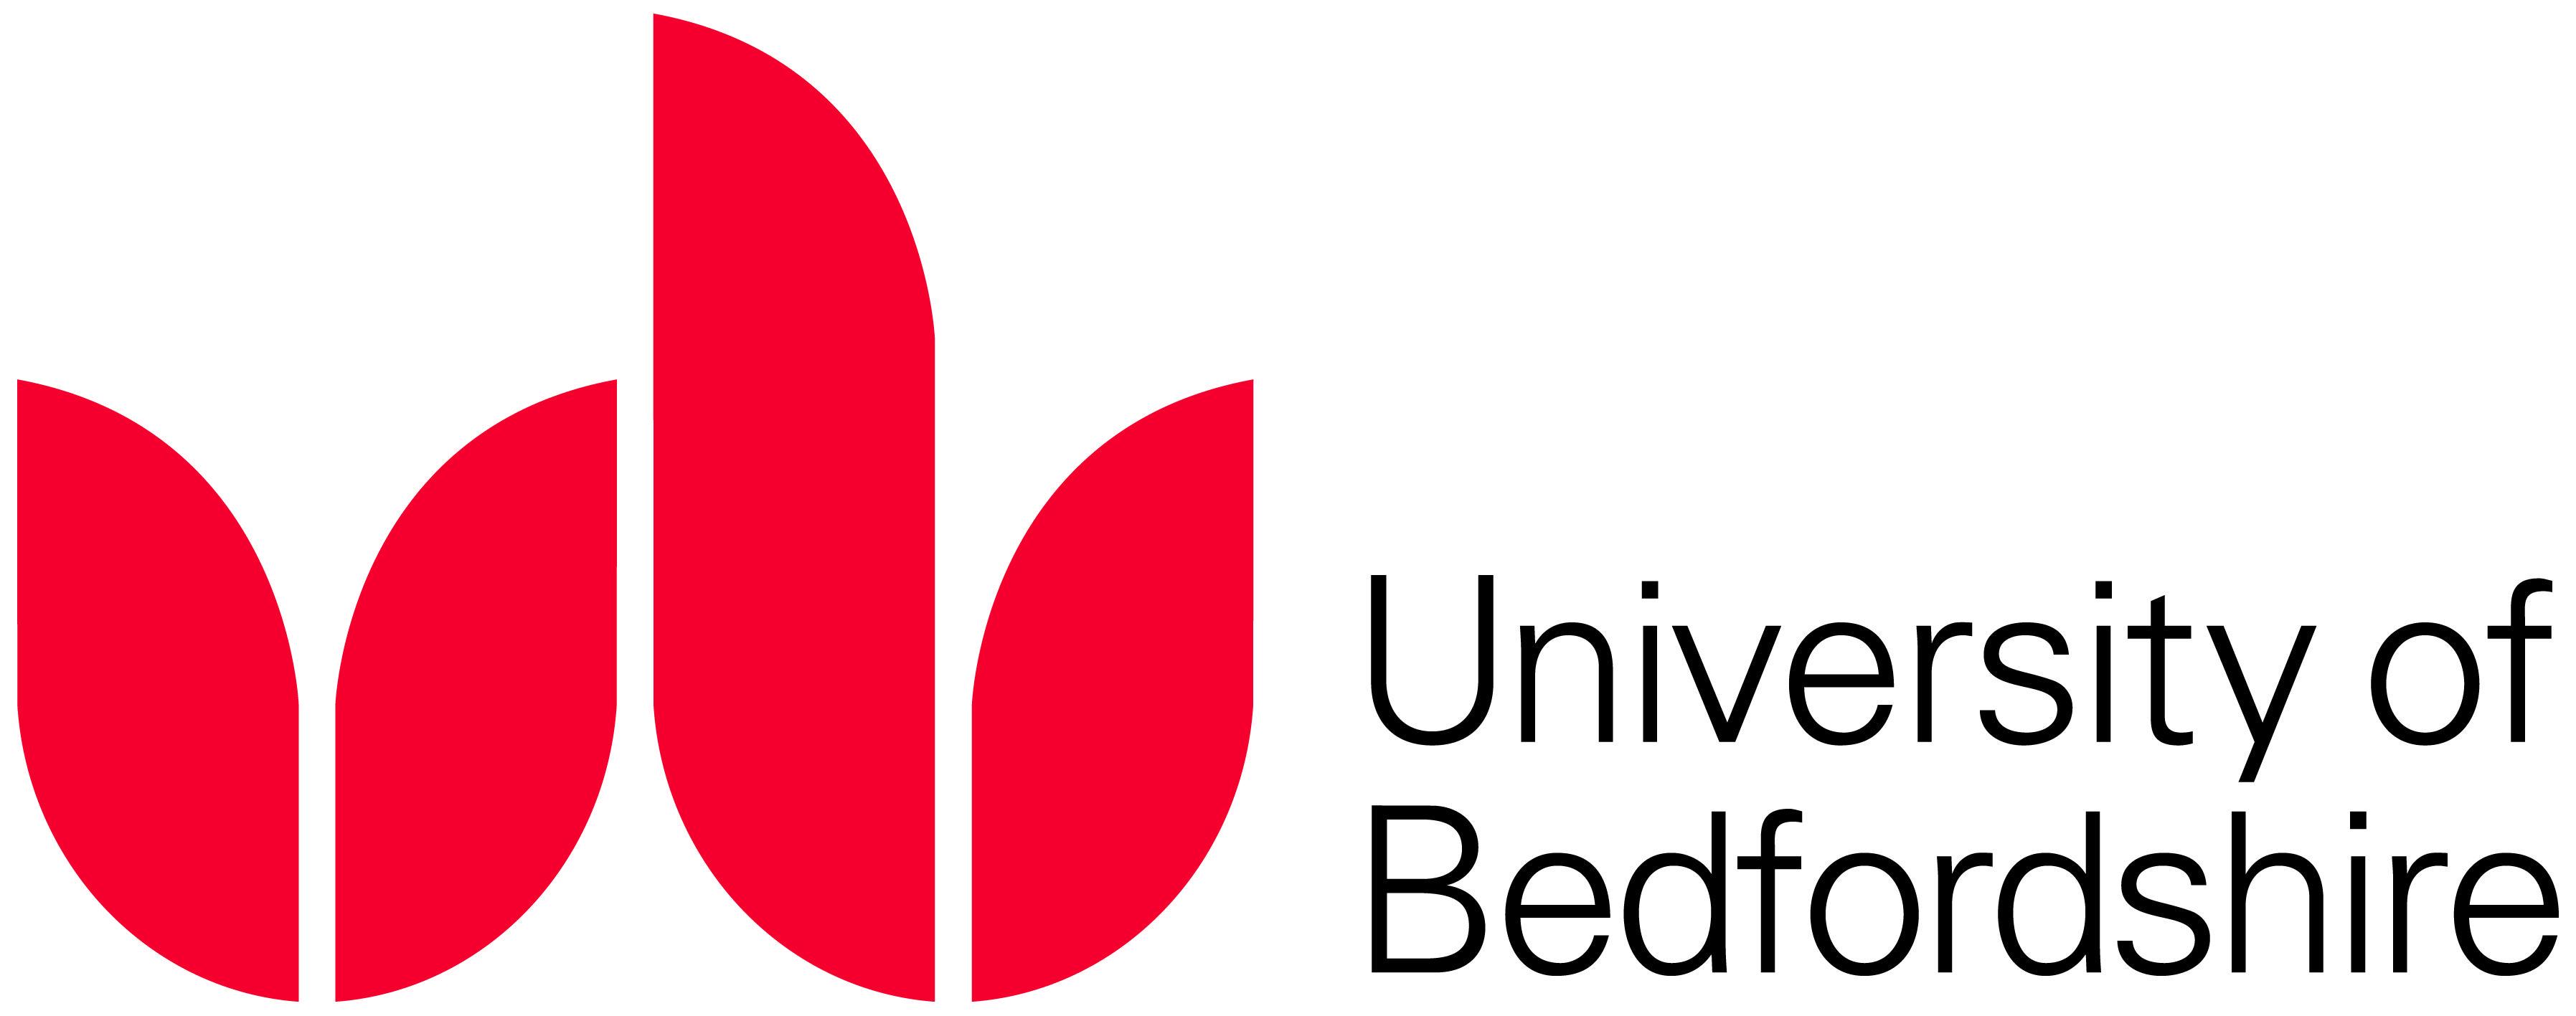 University of Bedfordshire Campus Tour - Bedf